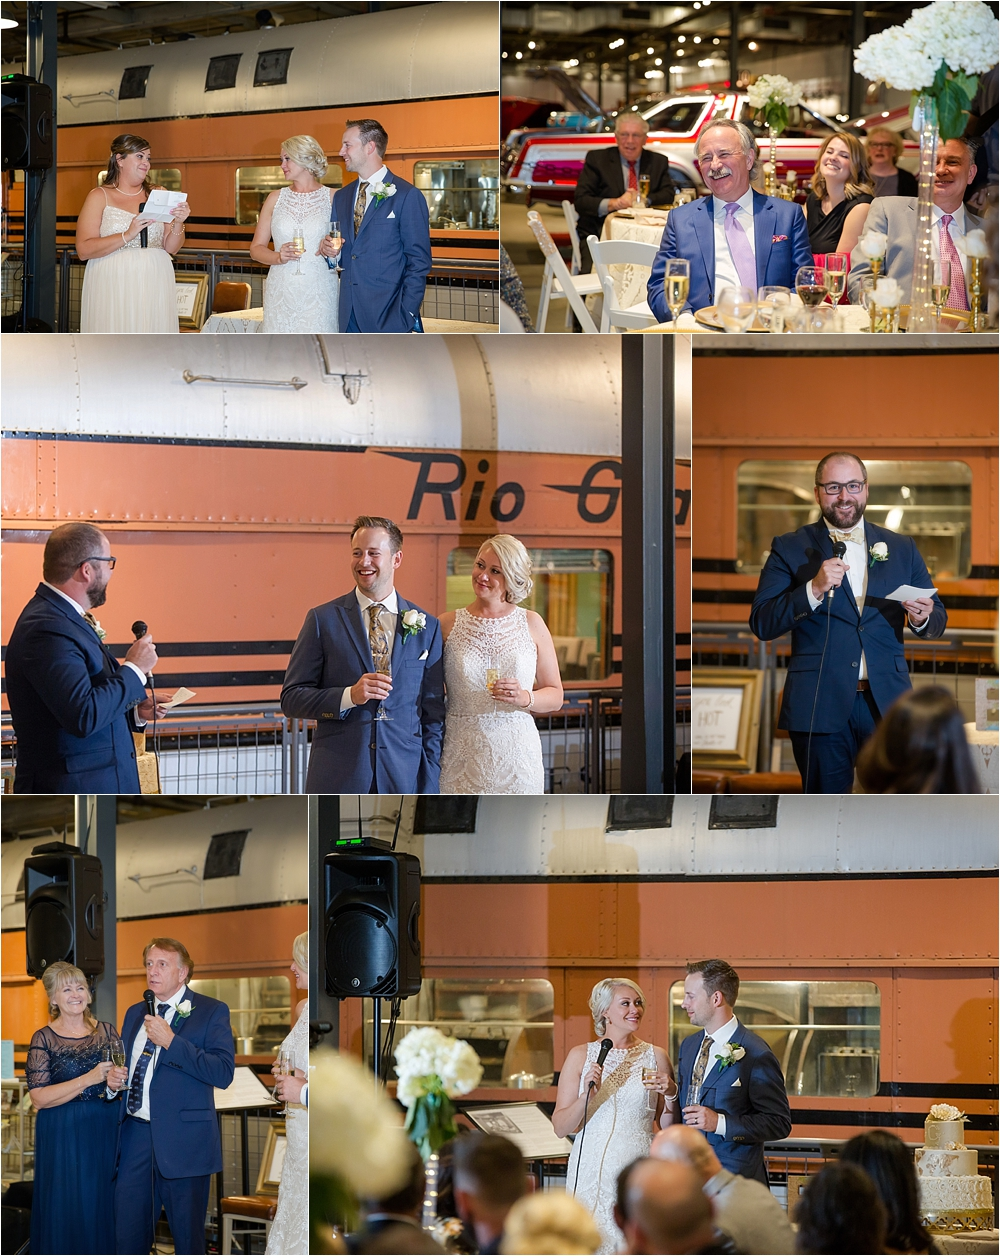 Trina + Elliott's Downtown Denver Wedding_0084.jpg